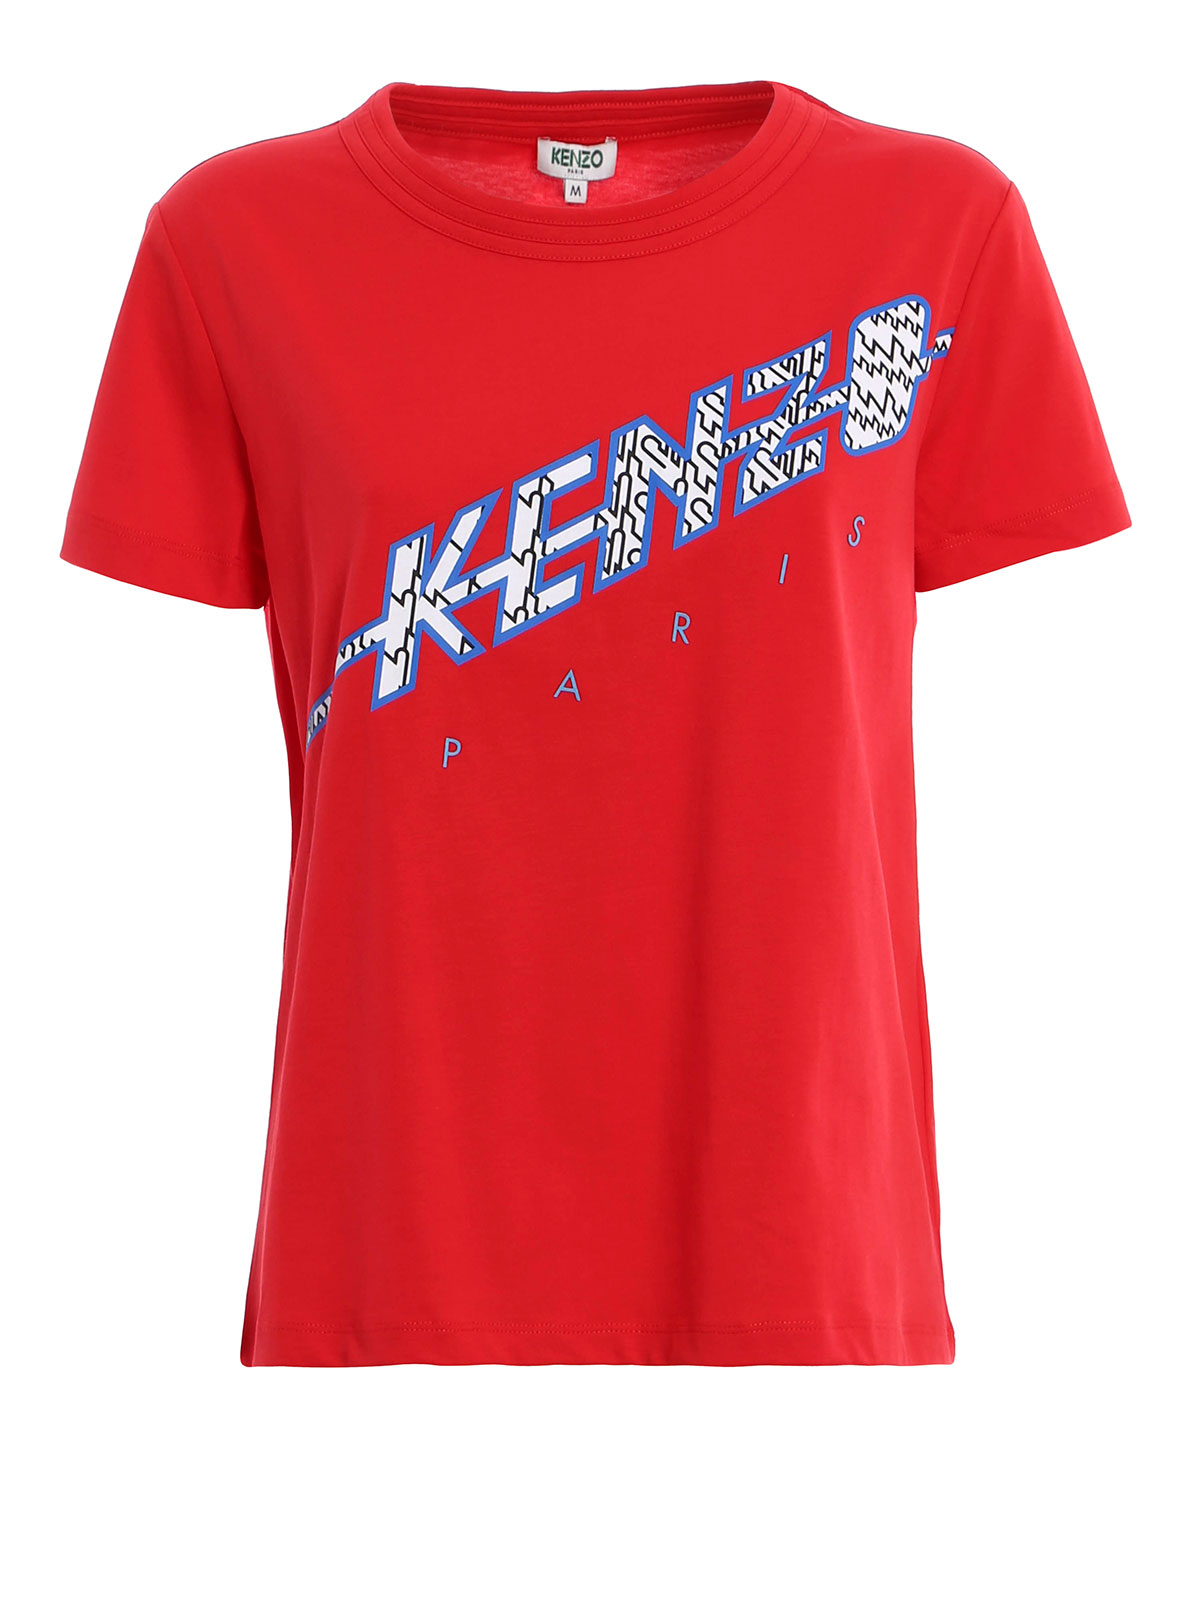 kenzo paris logo cotton t shirt by kenzo t shirts ikrix. Black Bedroom Furniture Sets. Home Design Ideas